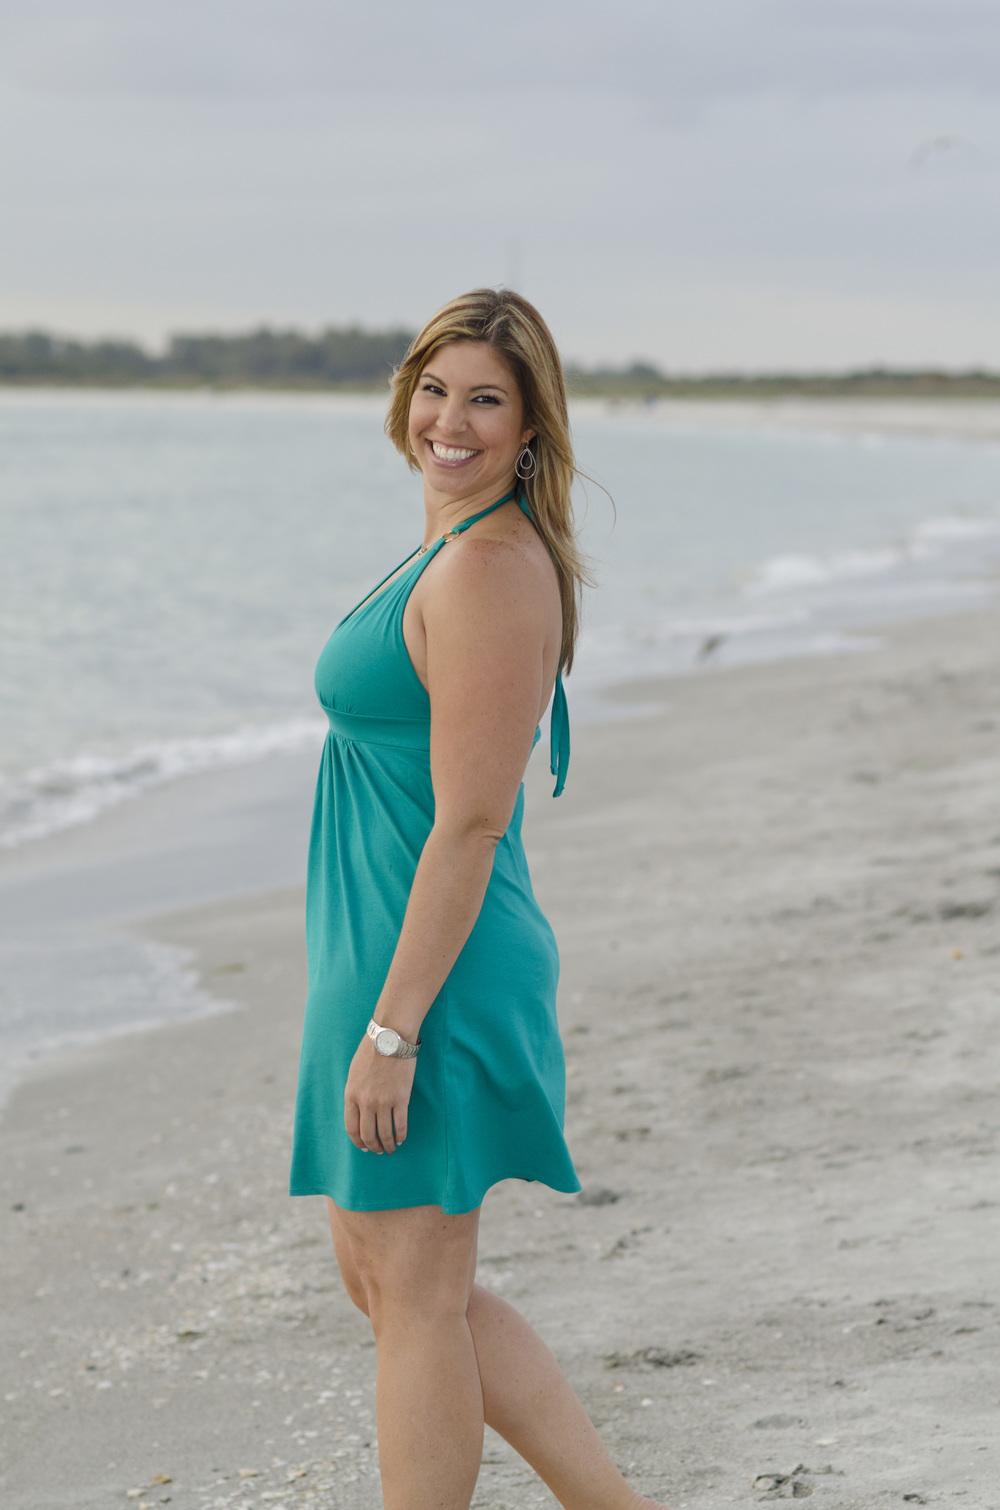 Beach engagement photo ideas - Tampa wedding photographer